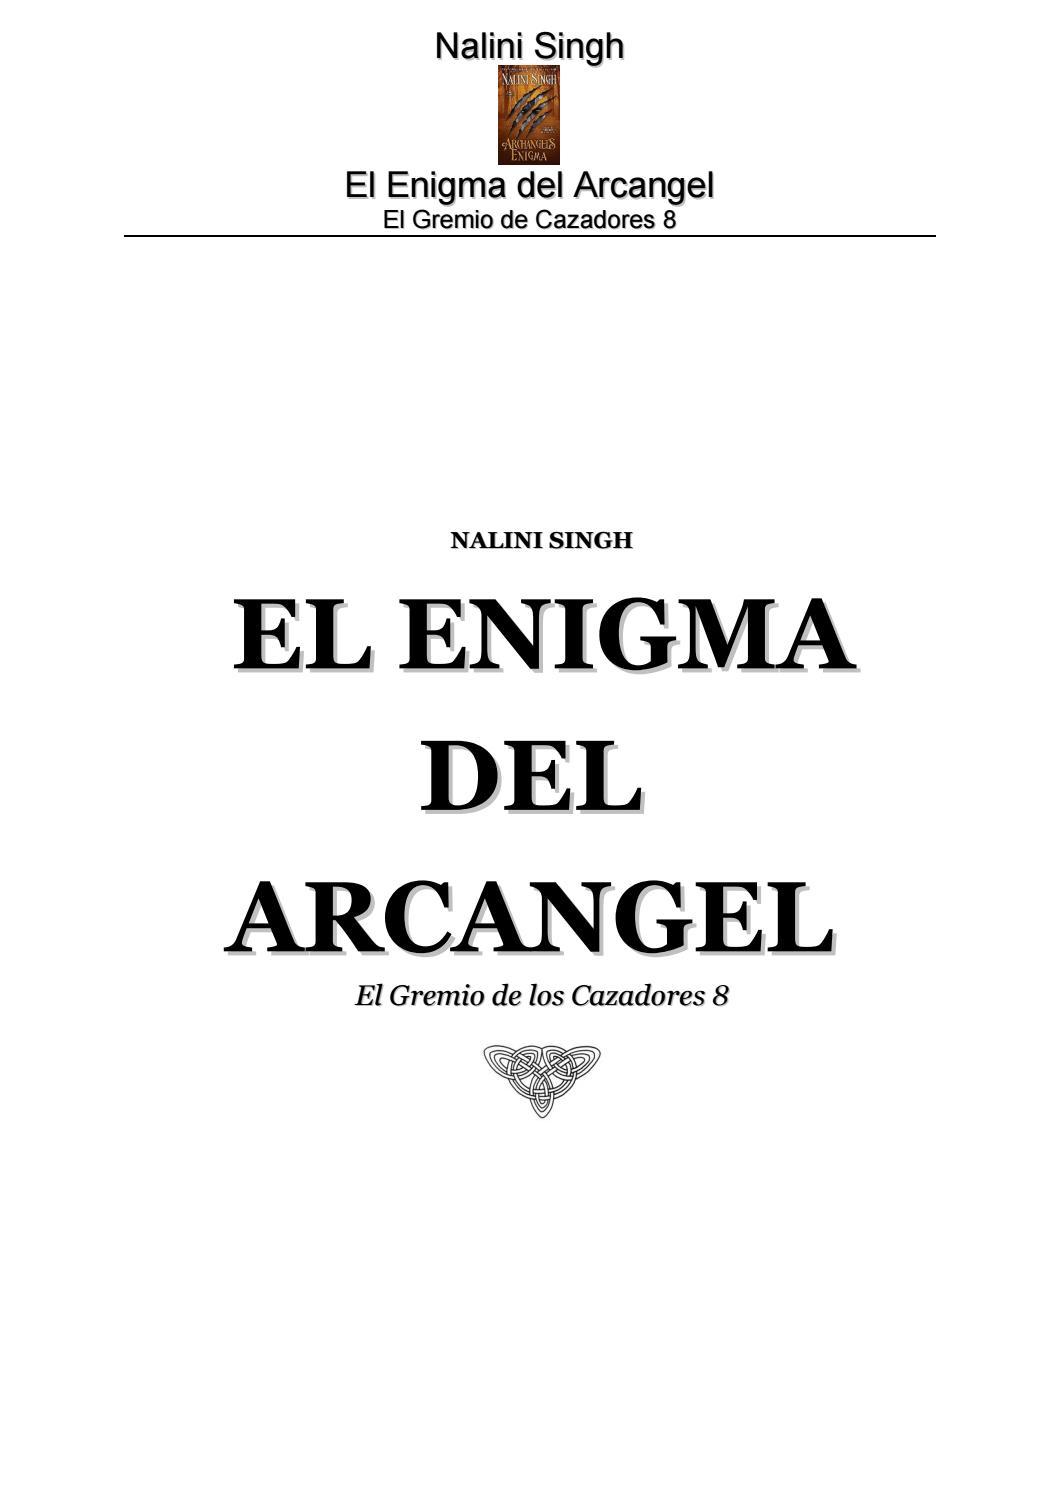 8 el enigma del arcangel by isela avila - issuu